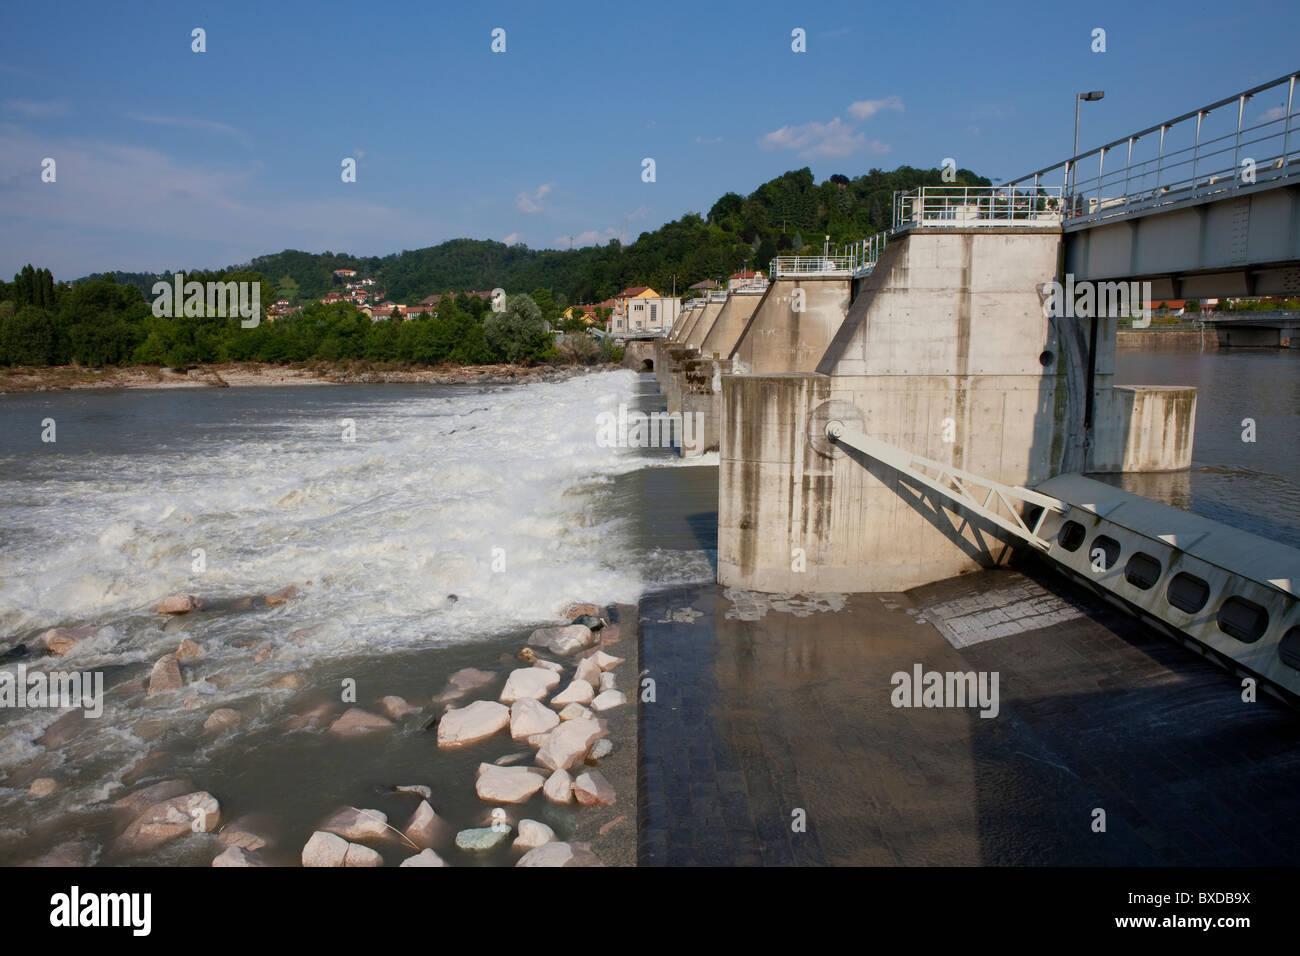 River Dam - Stock Image